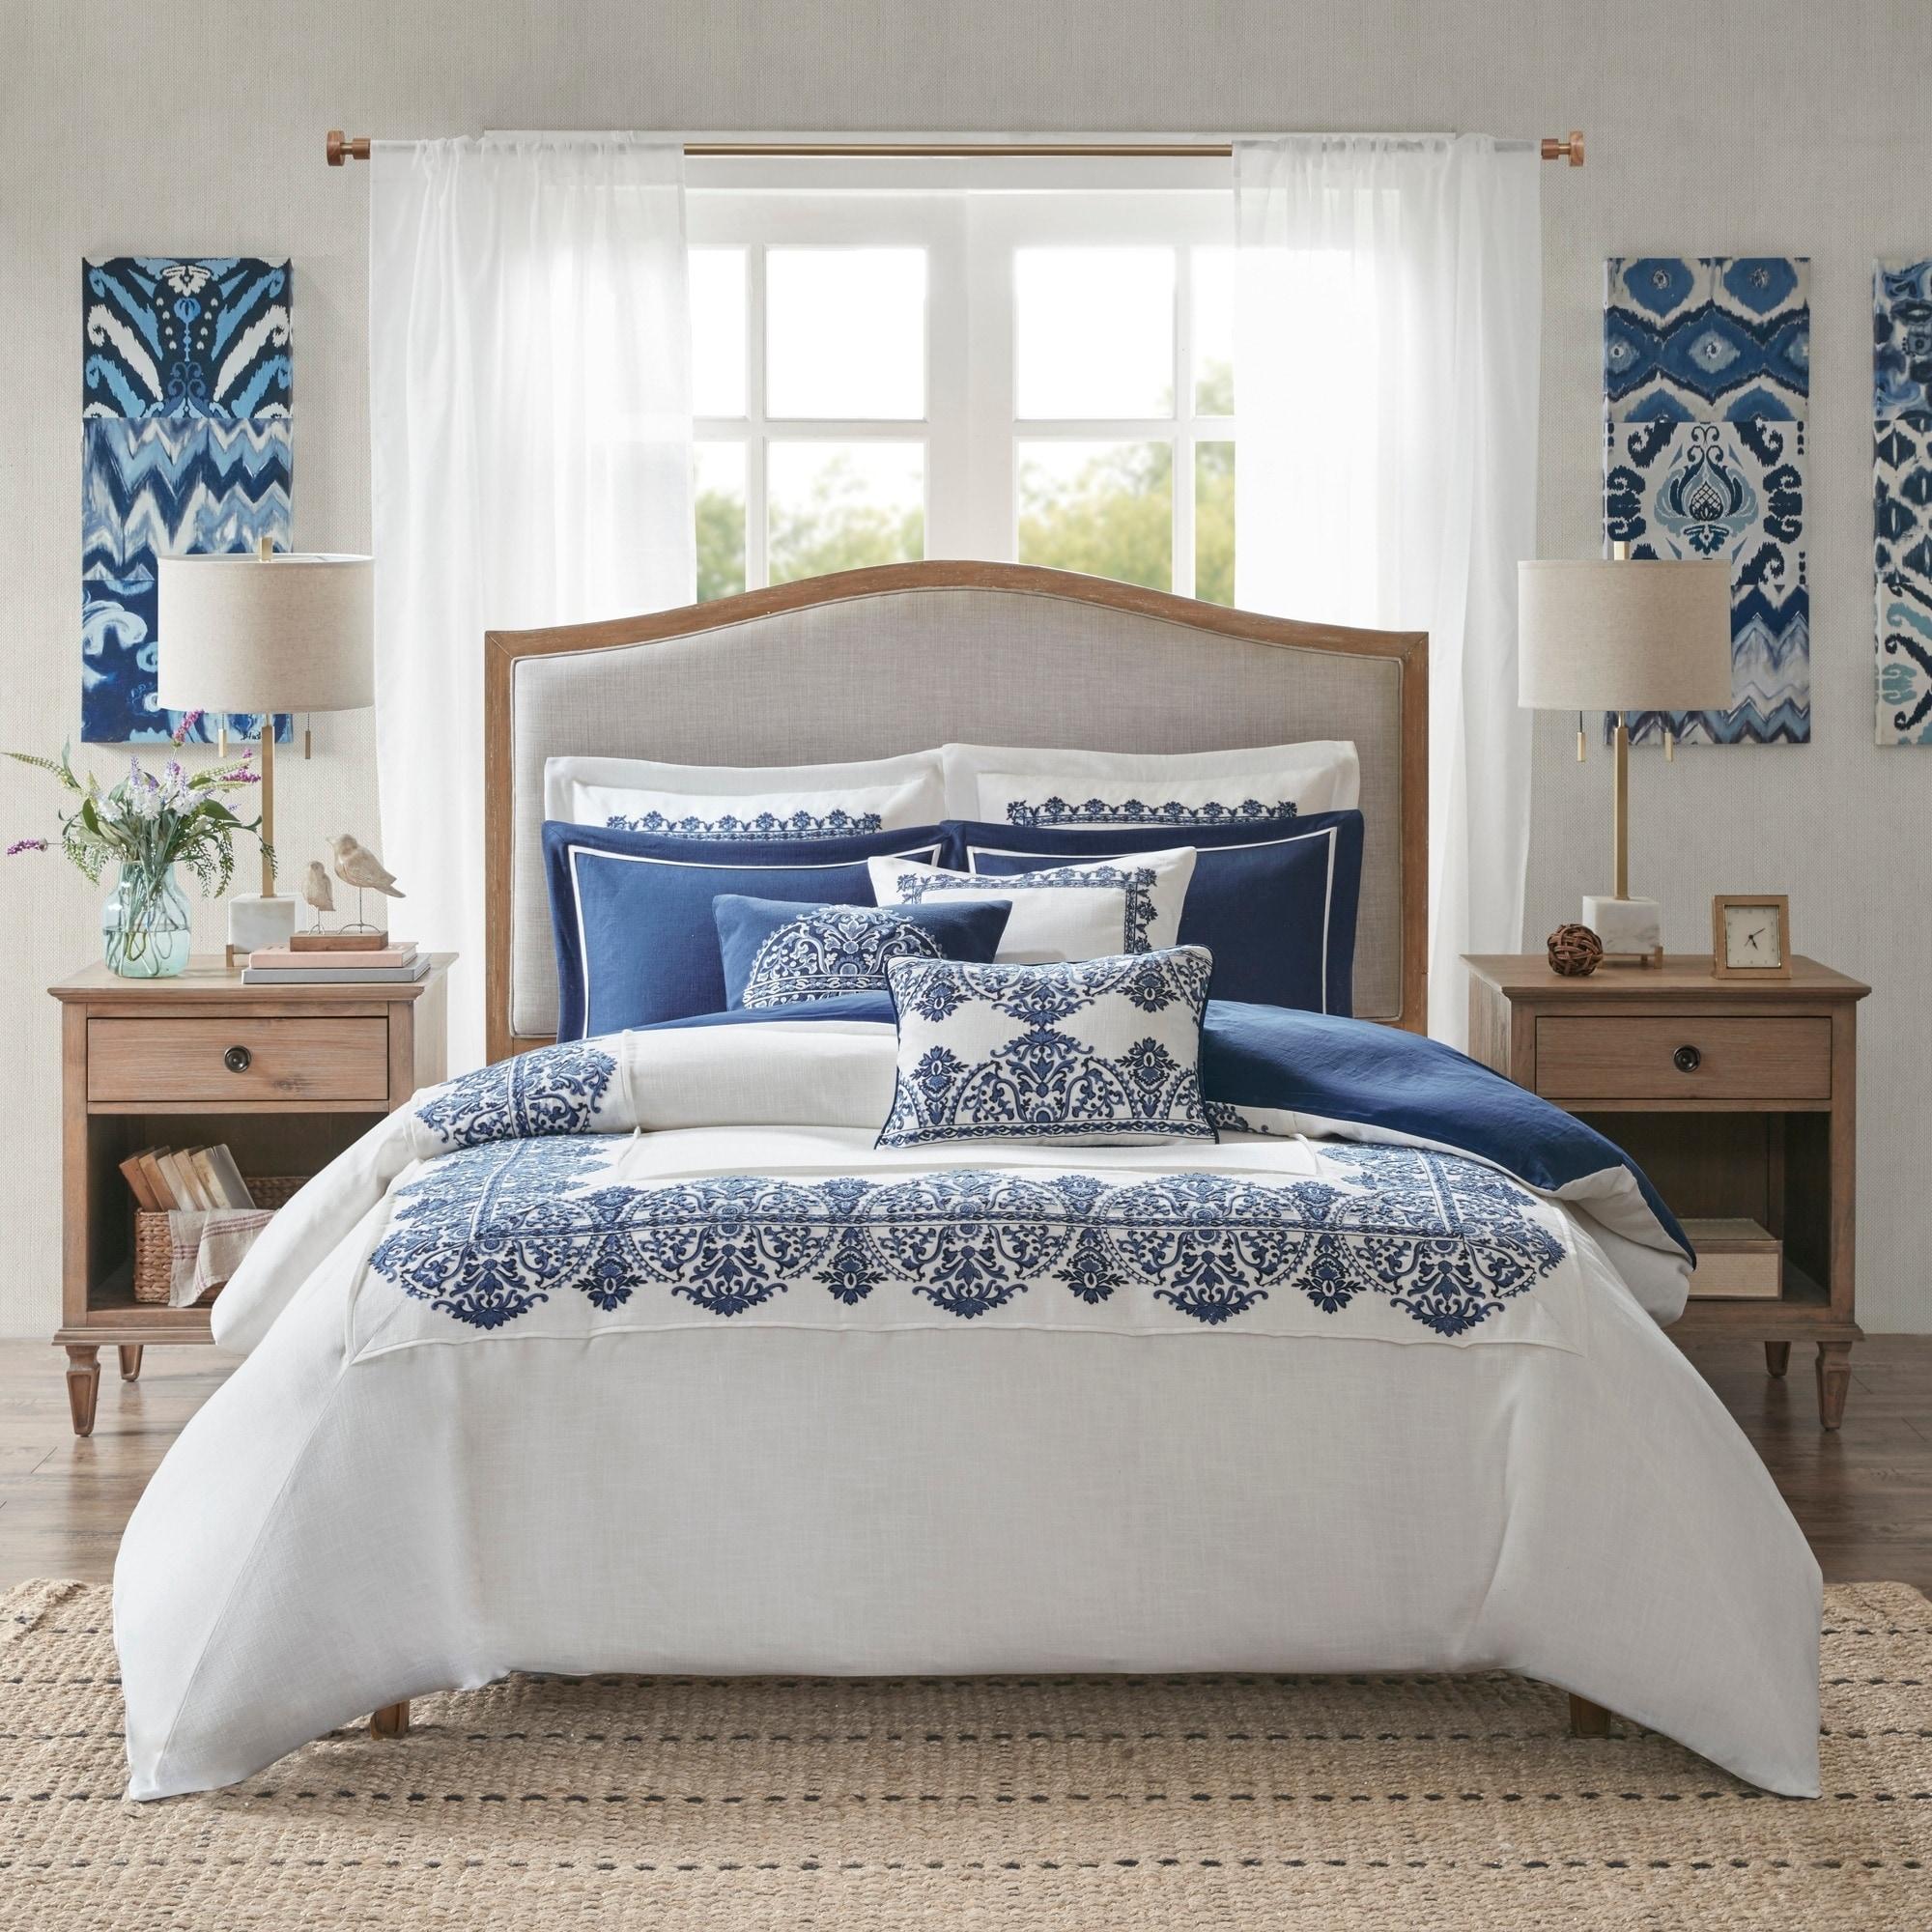 Shop Black Friday Deals On Madison Park Signature Indigo Sky White Blue Comforter Set On Sale Overstock 27800090